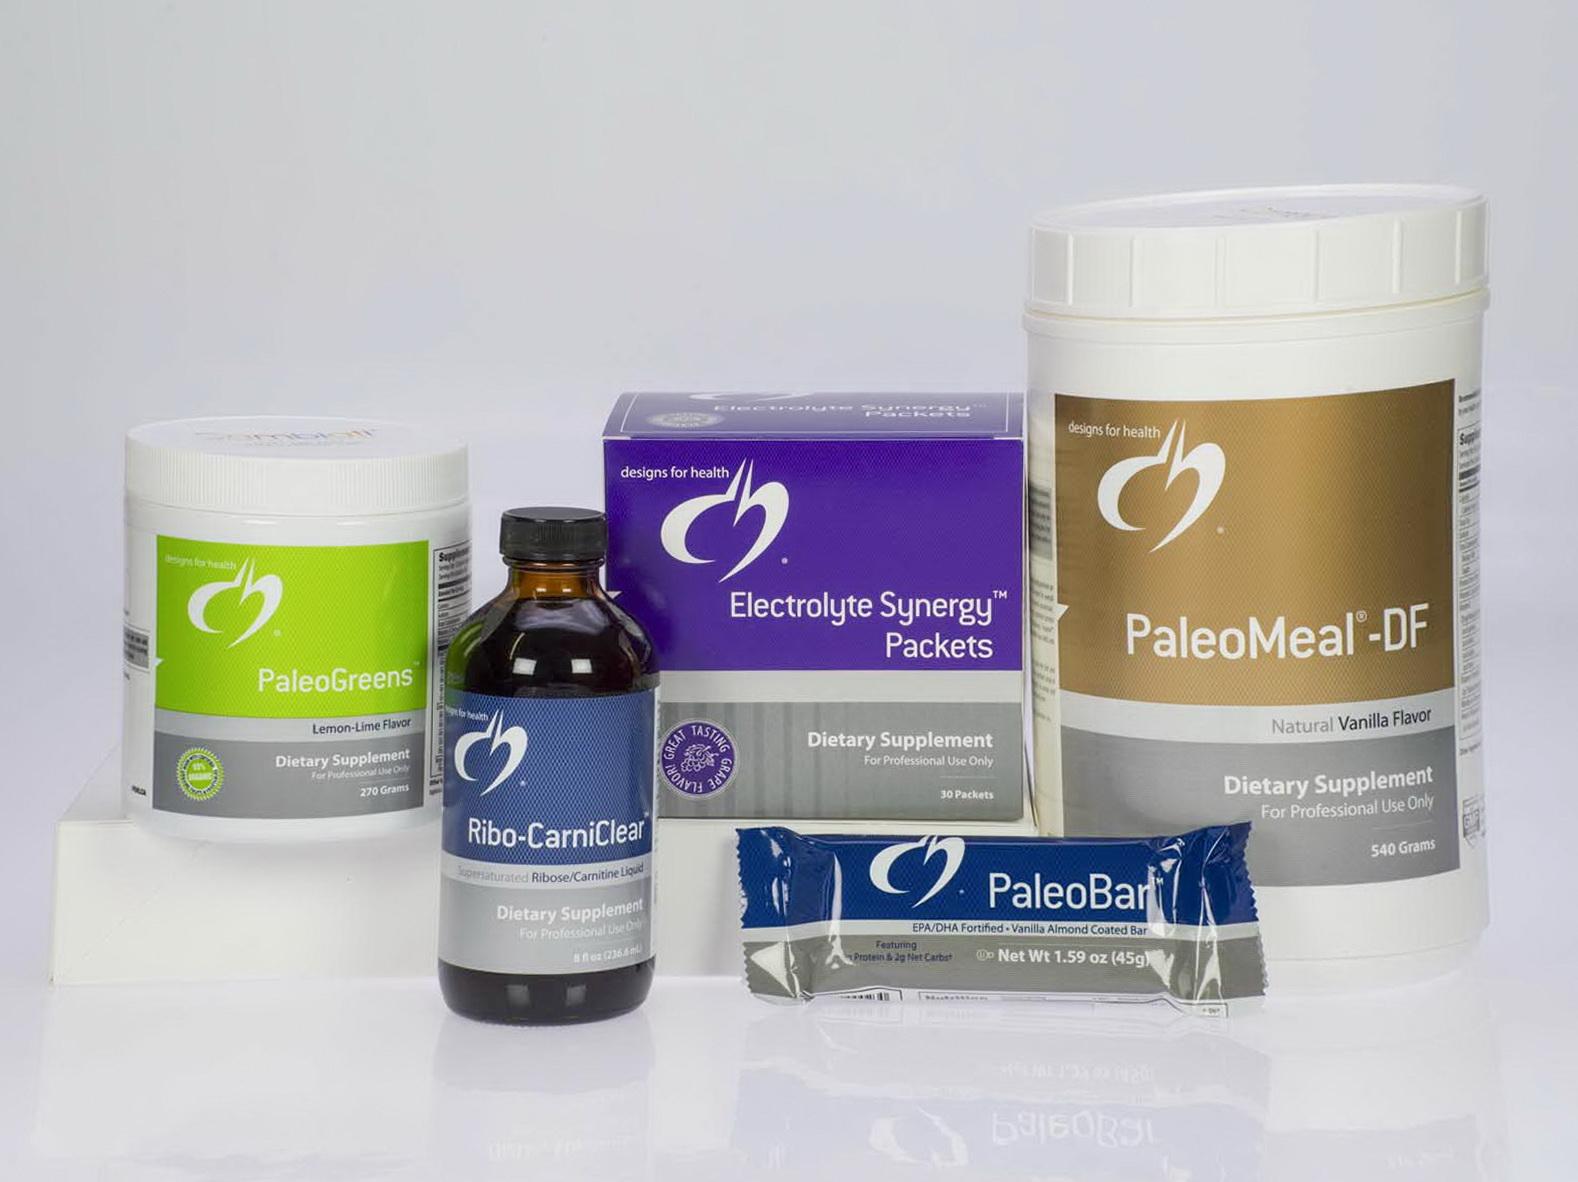 Endurance Athletes PaleoMeal, PaleoBars, PaleoGreens, Ribo-CarniClear, Electrolyte Synergy Packets.jpg